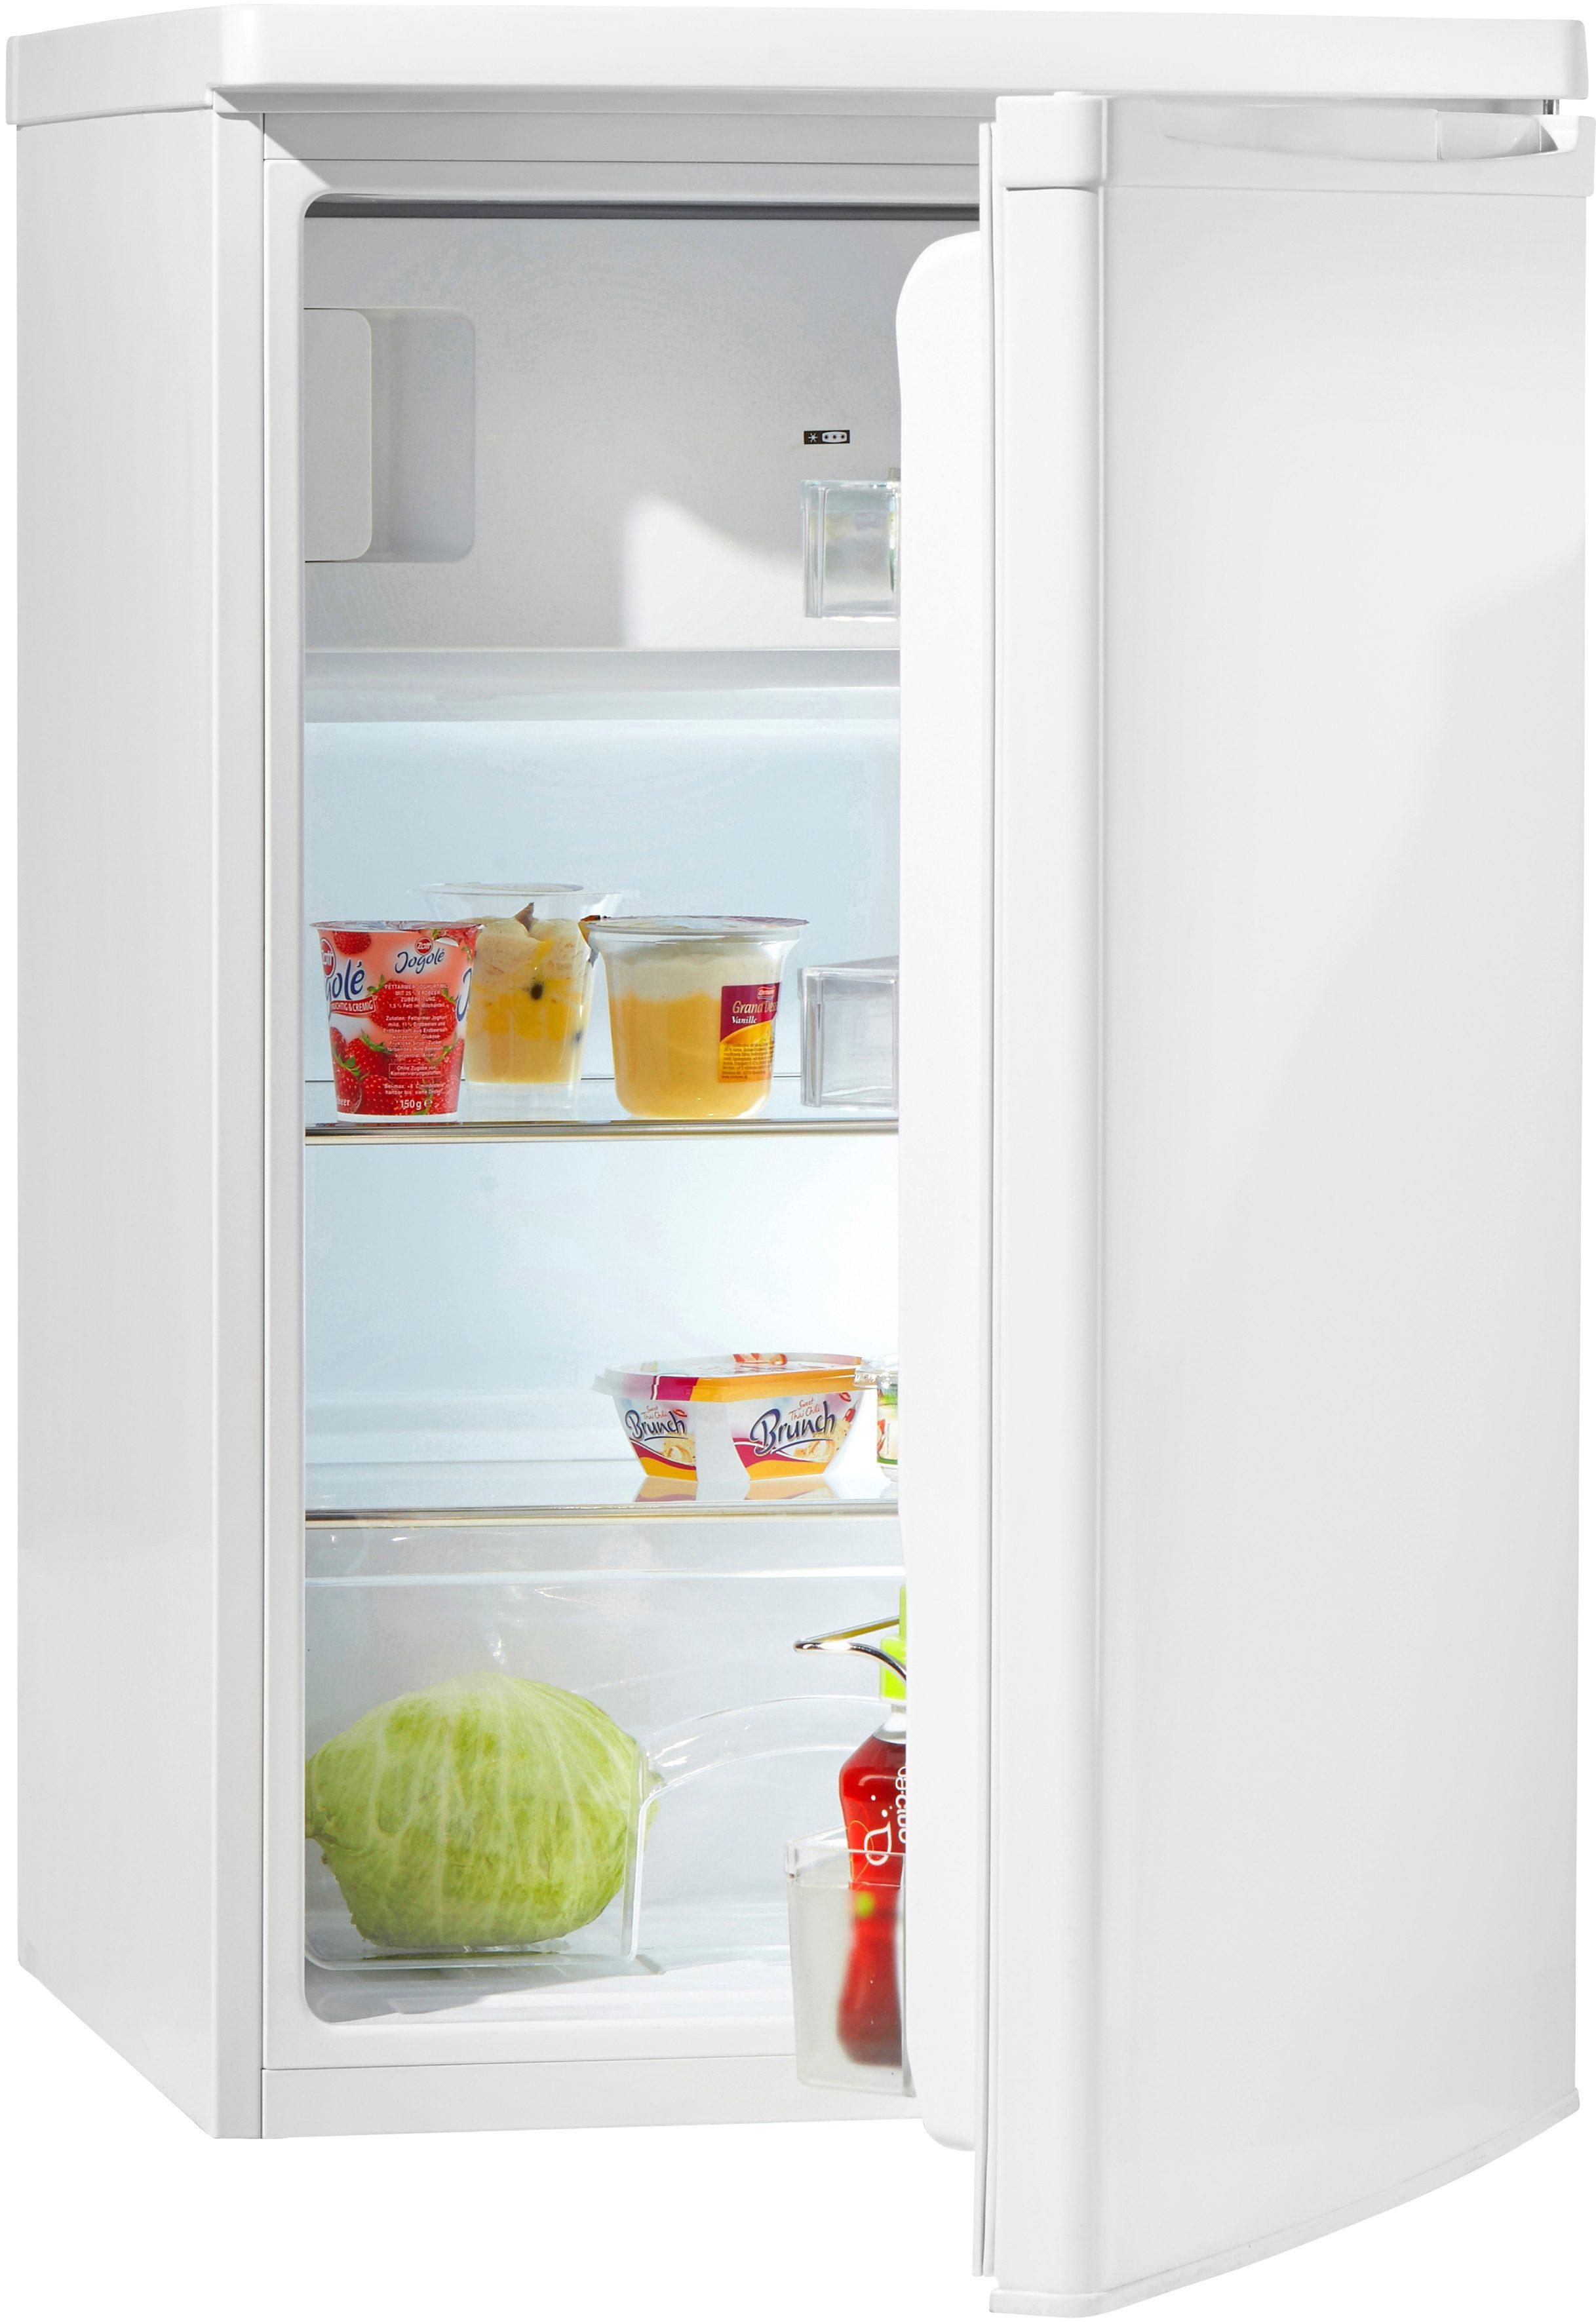 Hanseatic Kühlschrank HKS 8555GA3, A+++, 85 cm hoch